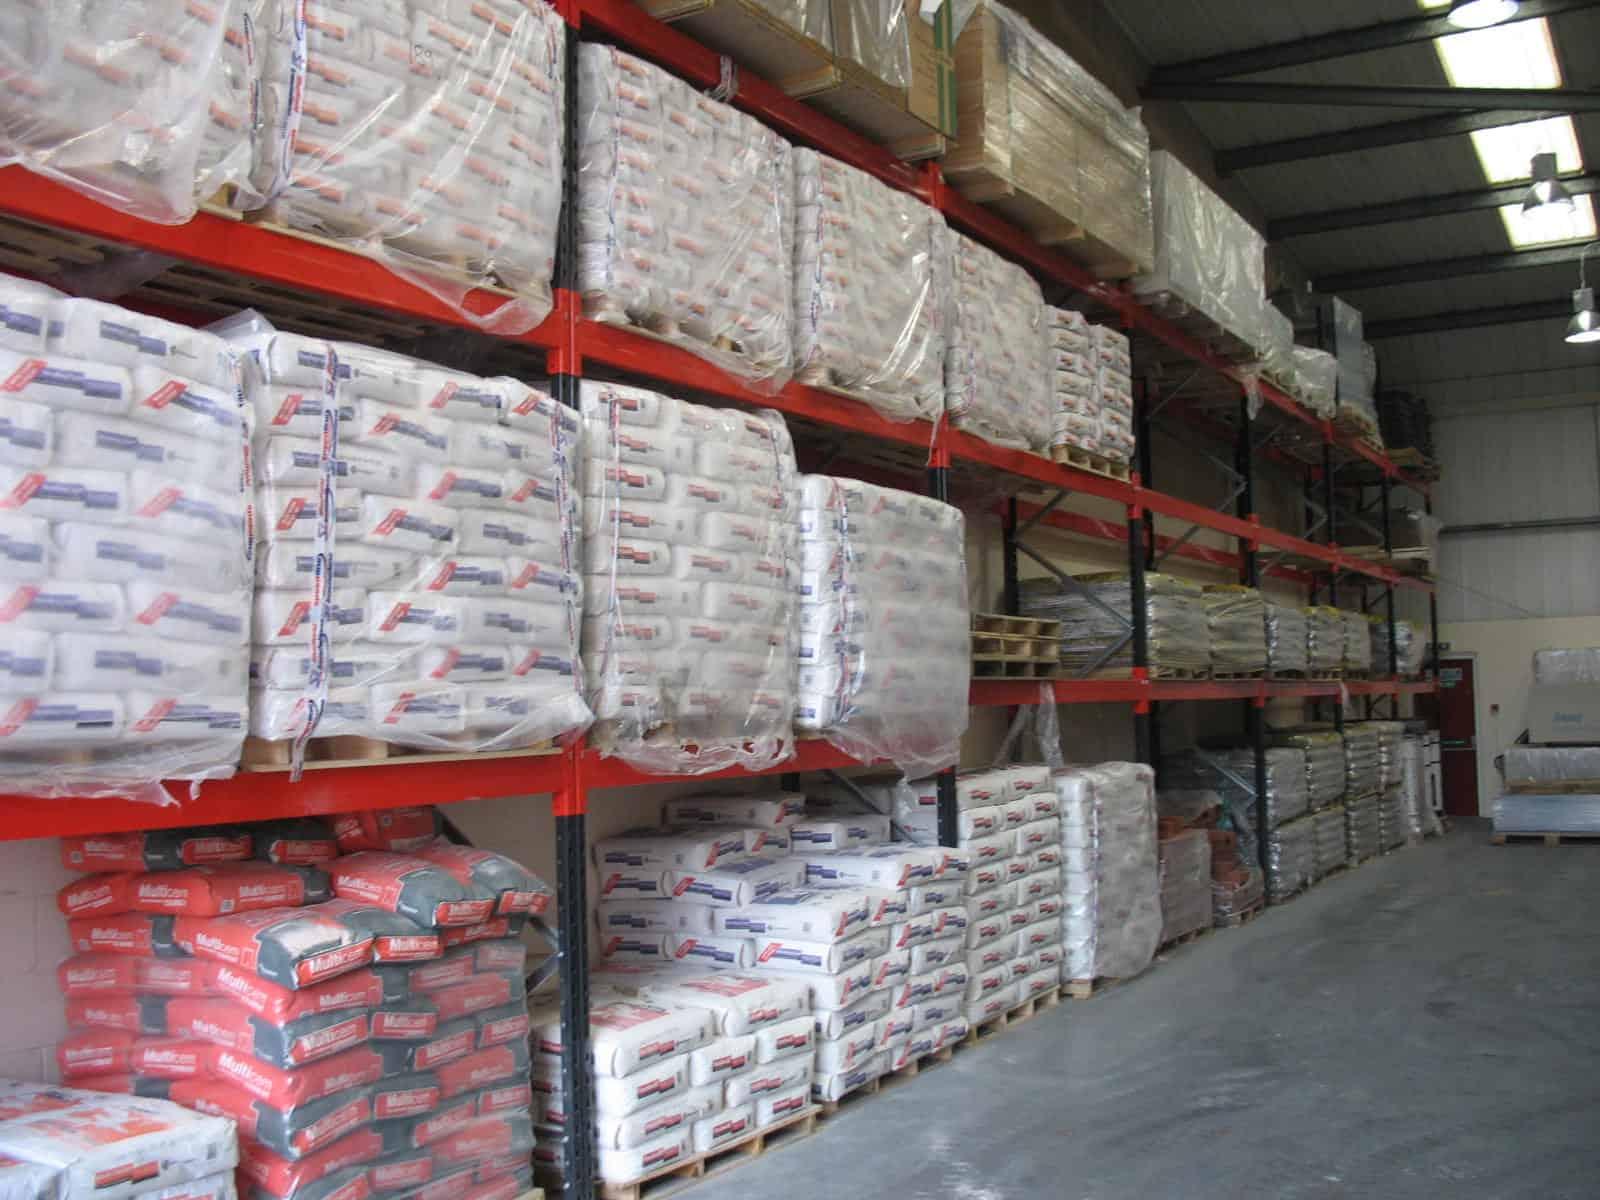 Building Materials Pallet Racks